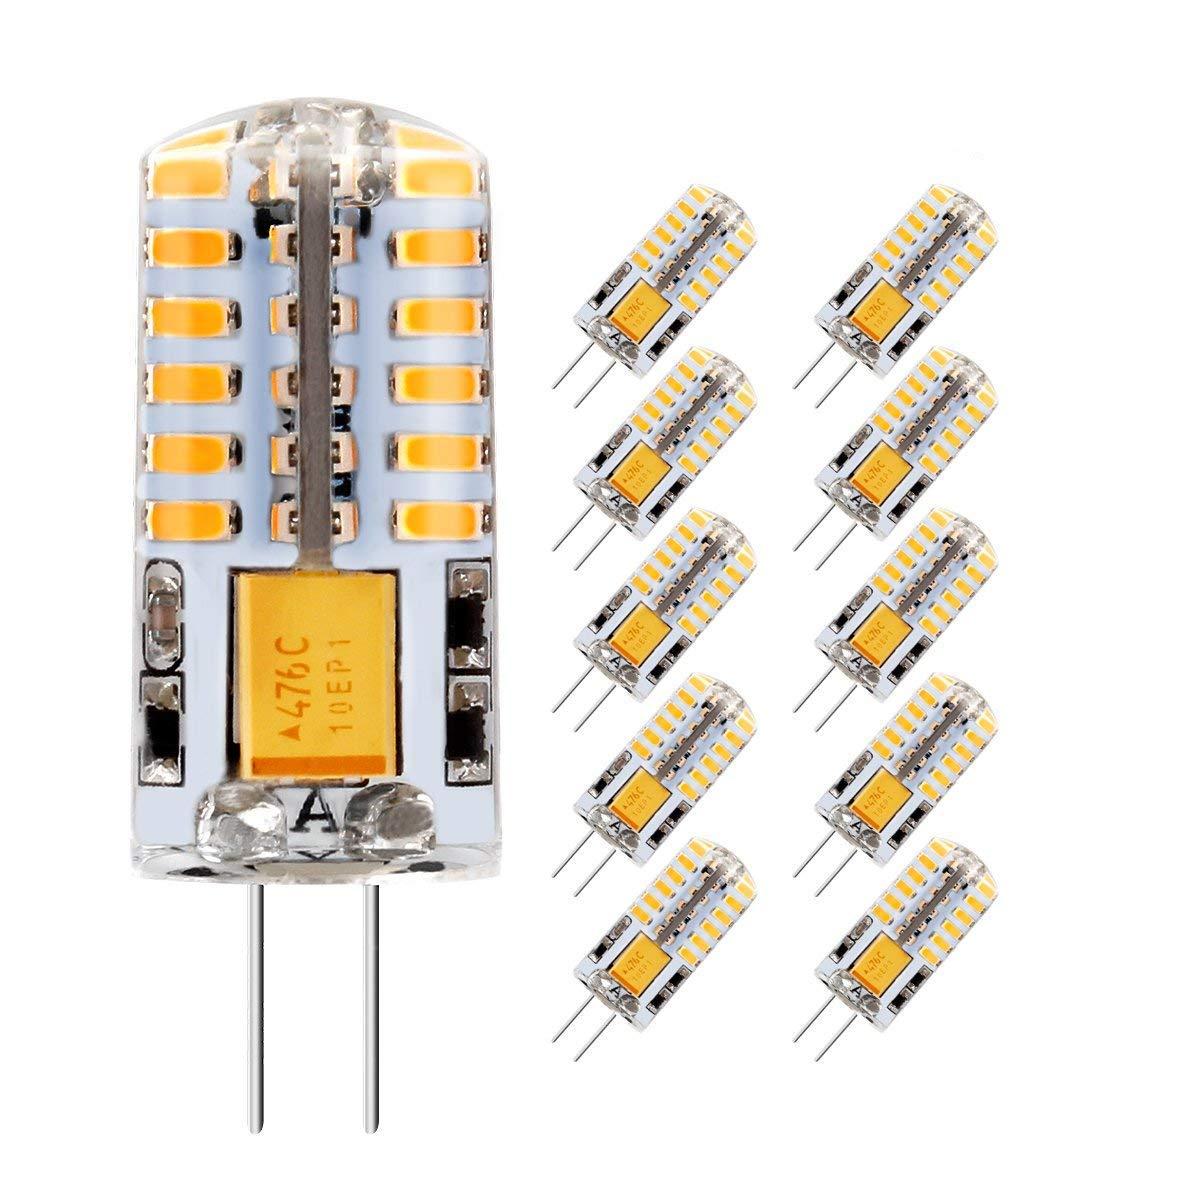 AveyLum 2.5W G4 LED Lampen Warmweiß , Ersatz fü r 20W Halogenlampen, 180lm, 3000K, 2835 SMD Kieselgel LED Dekorative Kronleuchter Beleuchtung, LED Birnen, LED Leuchtmittel, AC/DC 12V, 10er Pack